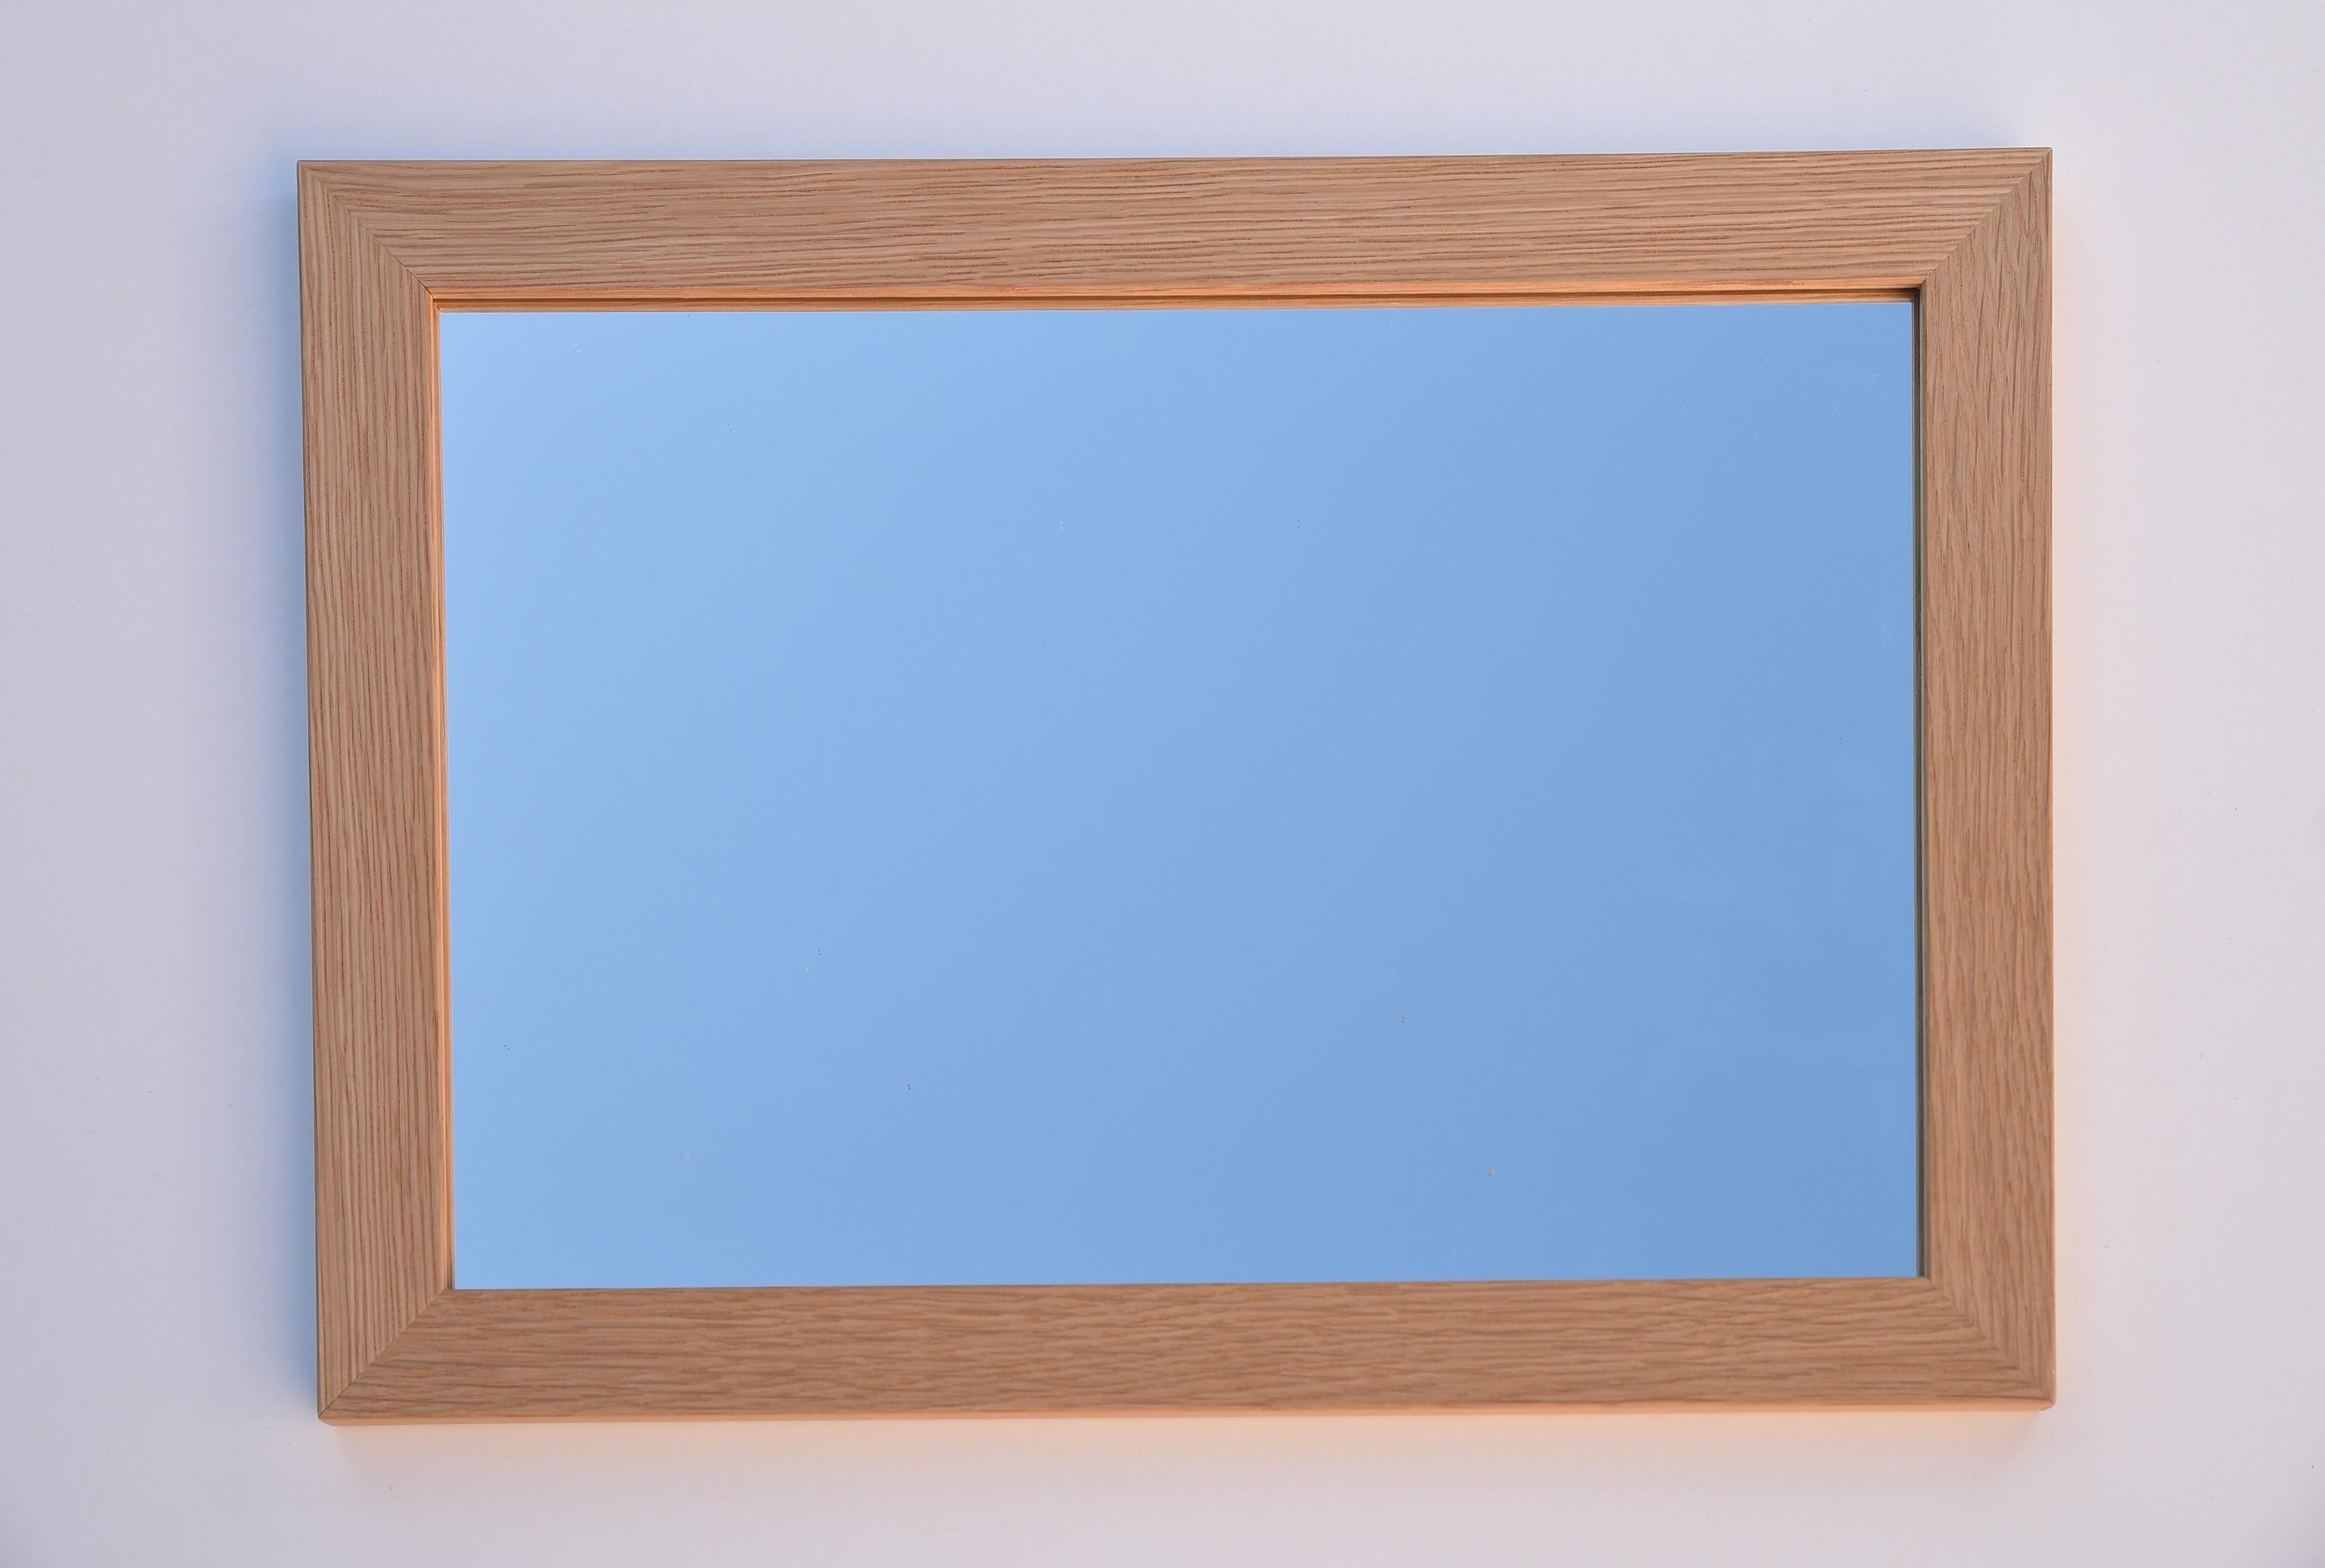 112 miroir biseaute sans cadre radiateur miroir for Miroir 90x60